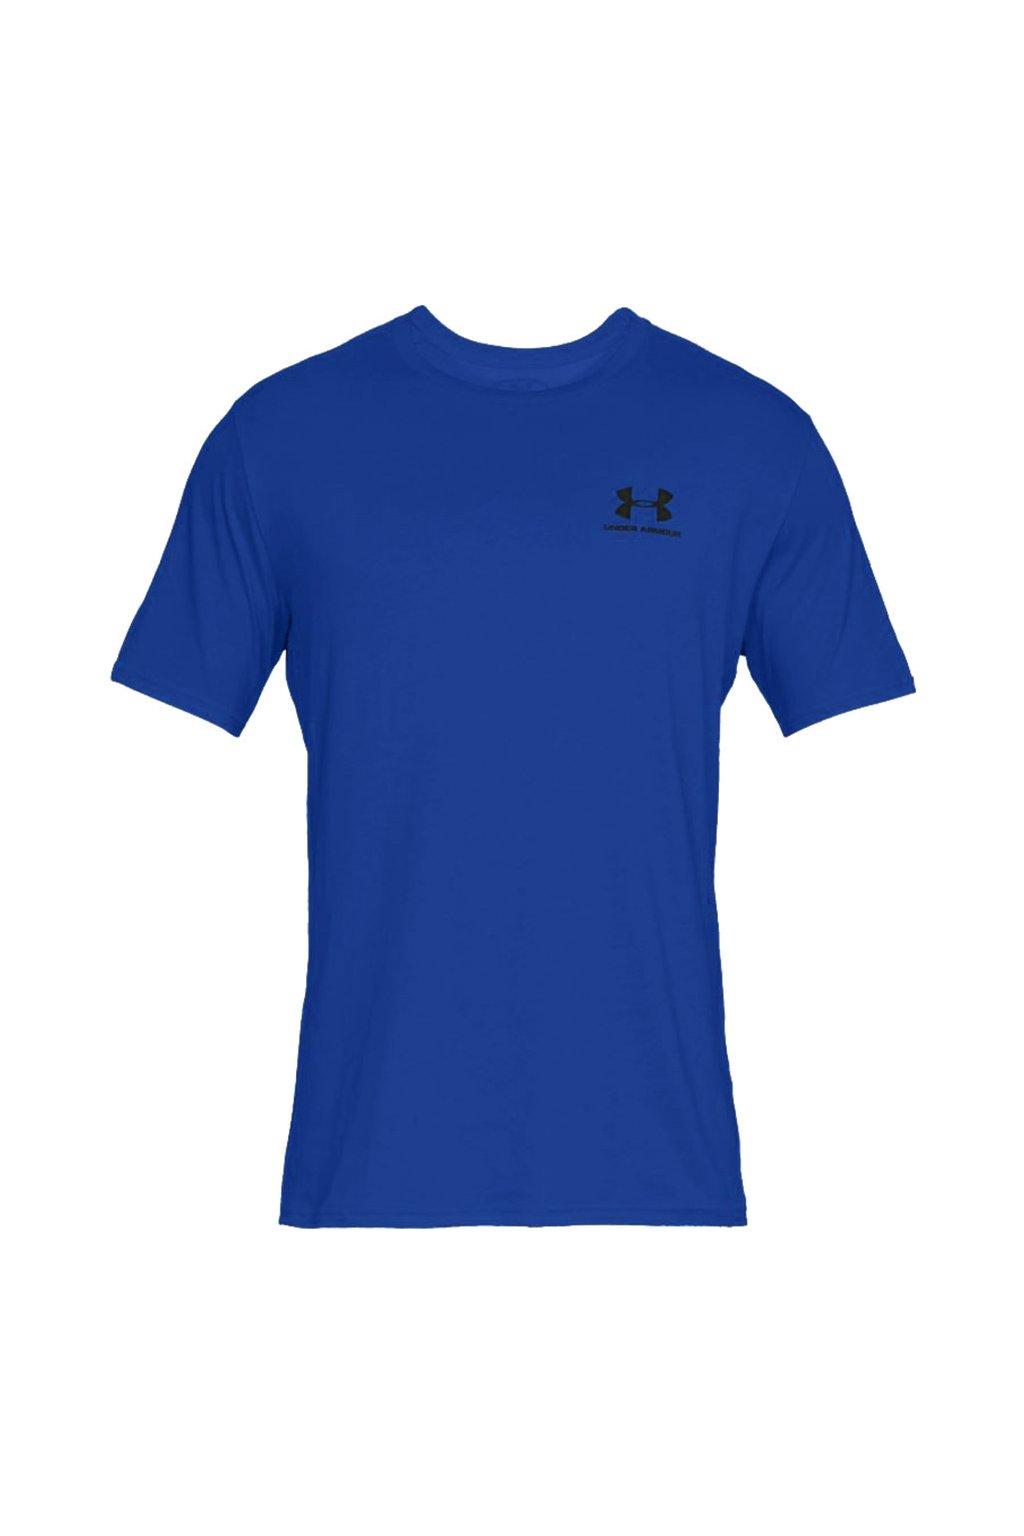 Pánske tričko Under Armour Sportstyle Left Chest SS modré 1326799-486